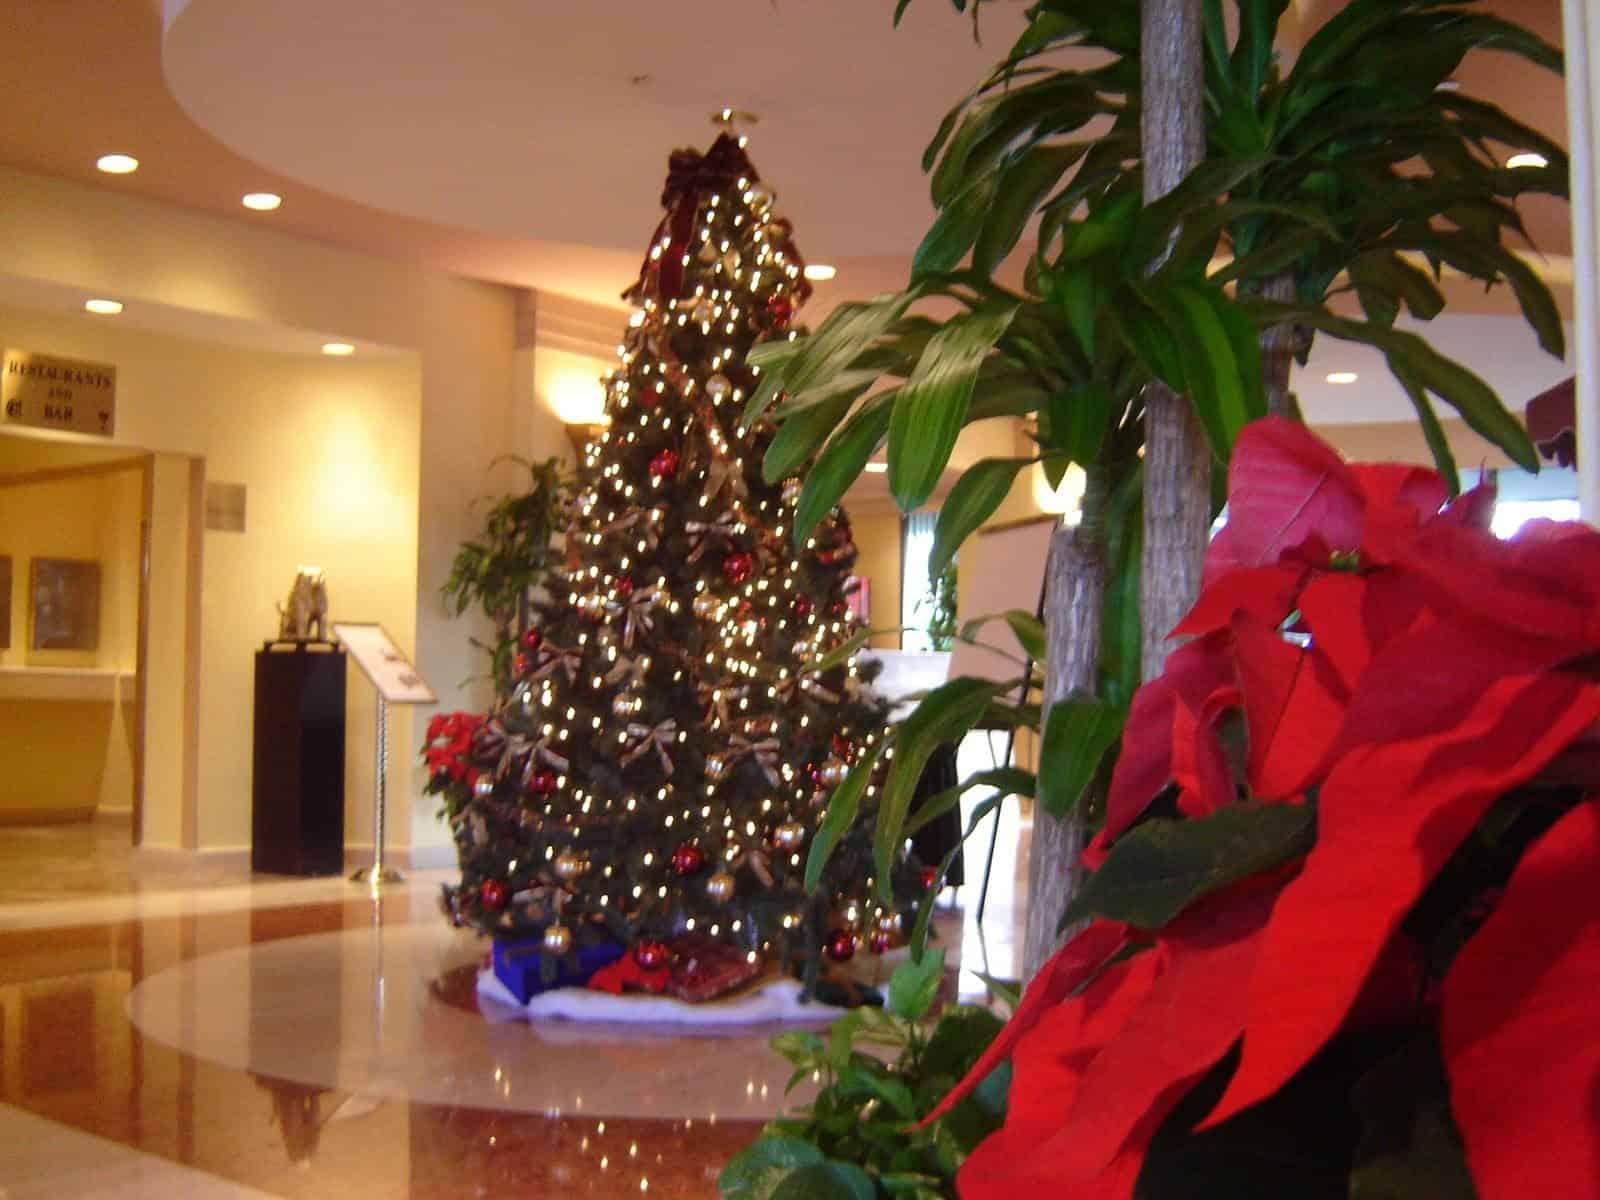 Hotel Tree Decorations in Westhampton, Long Island NY